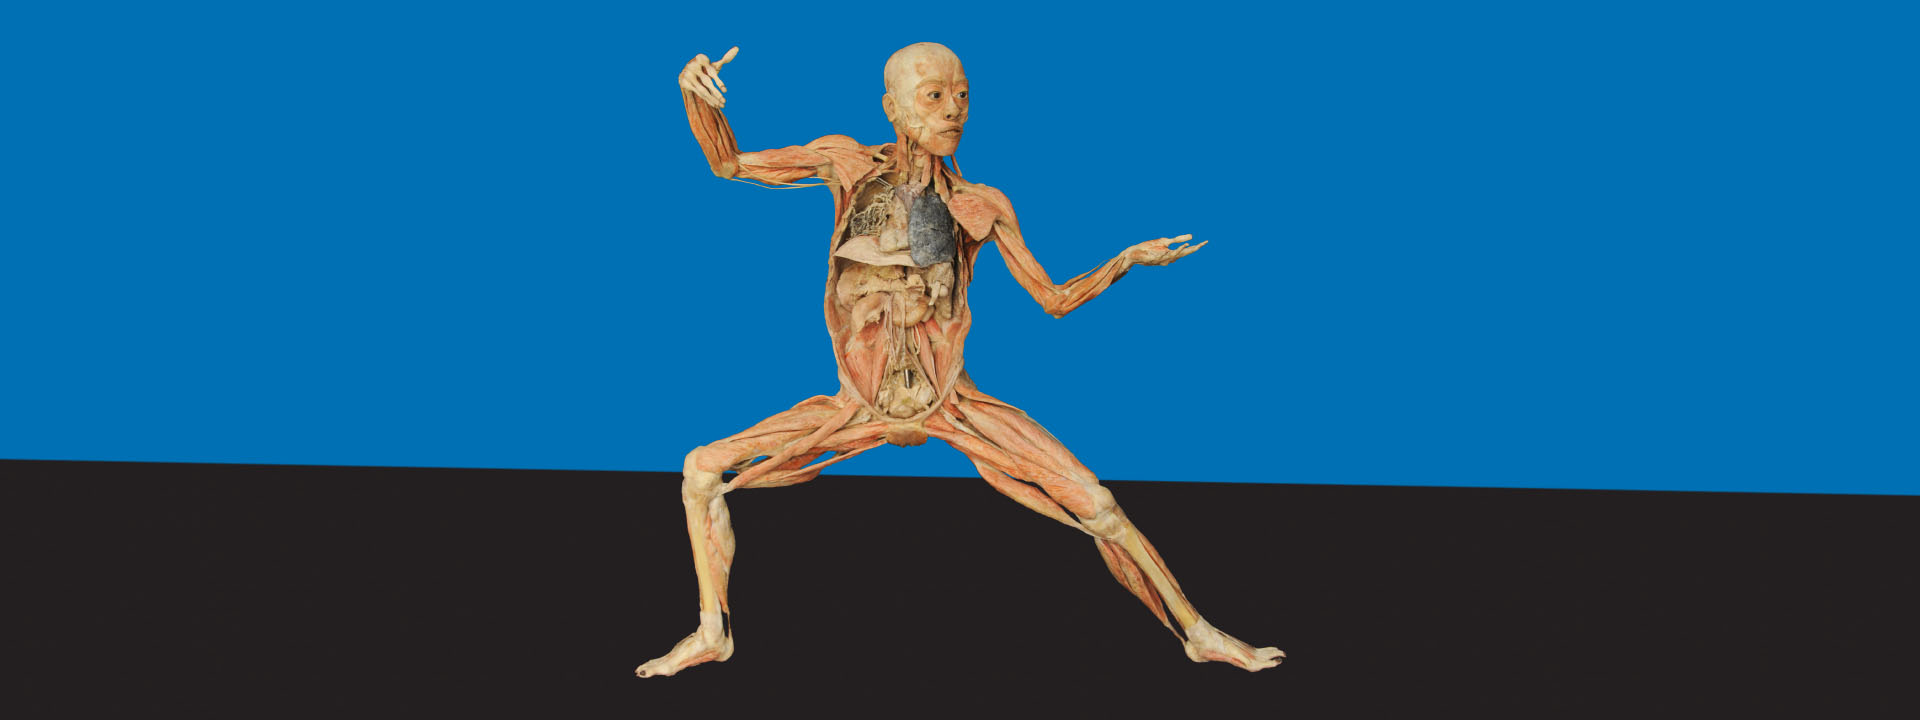 O que anatomia humana